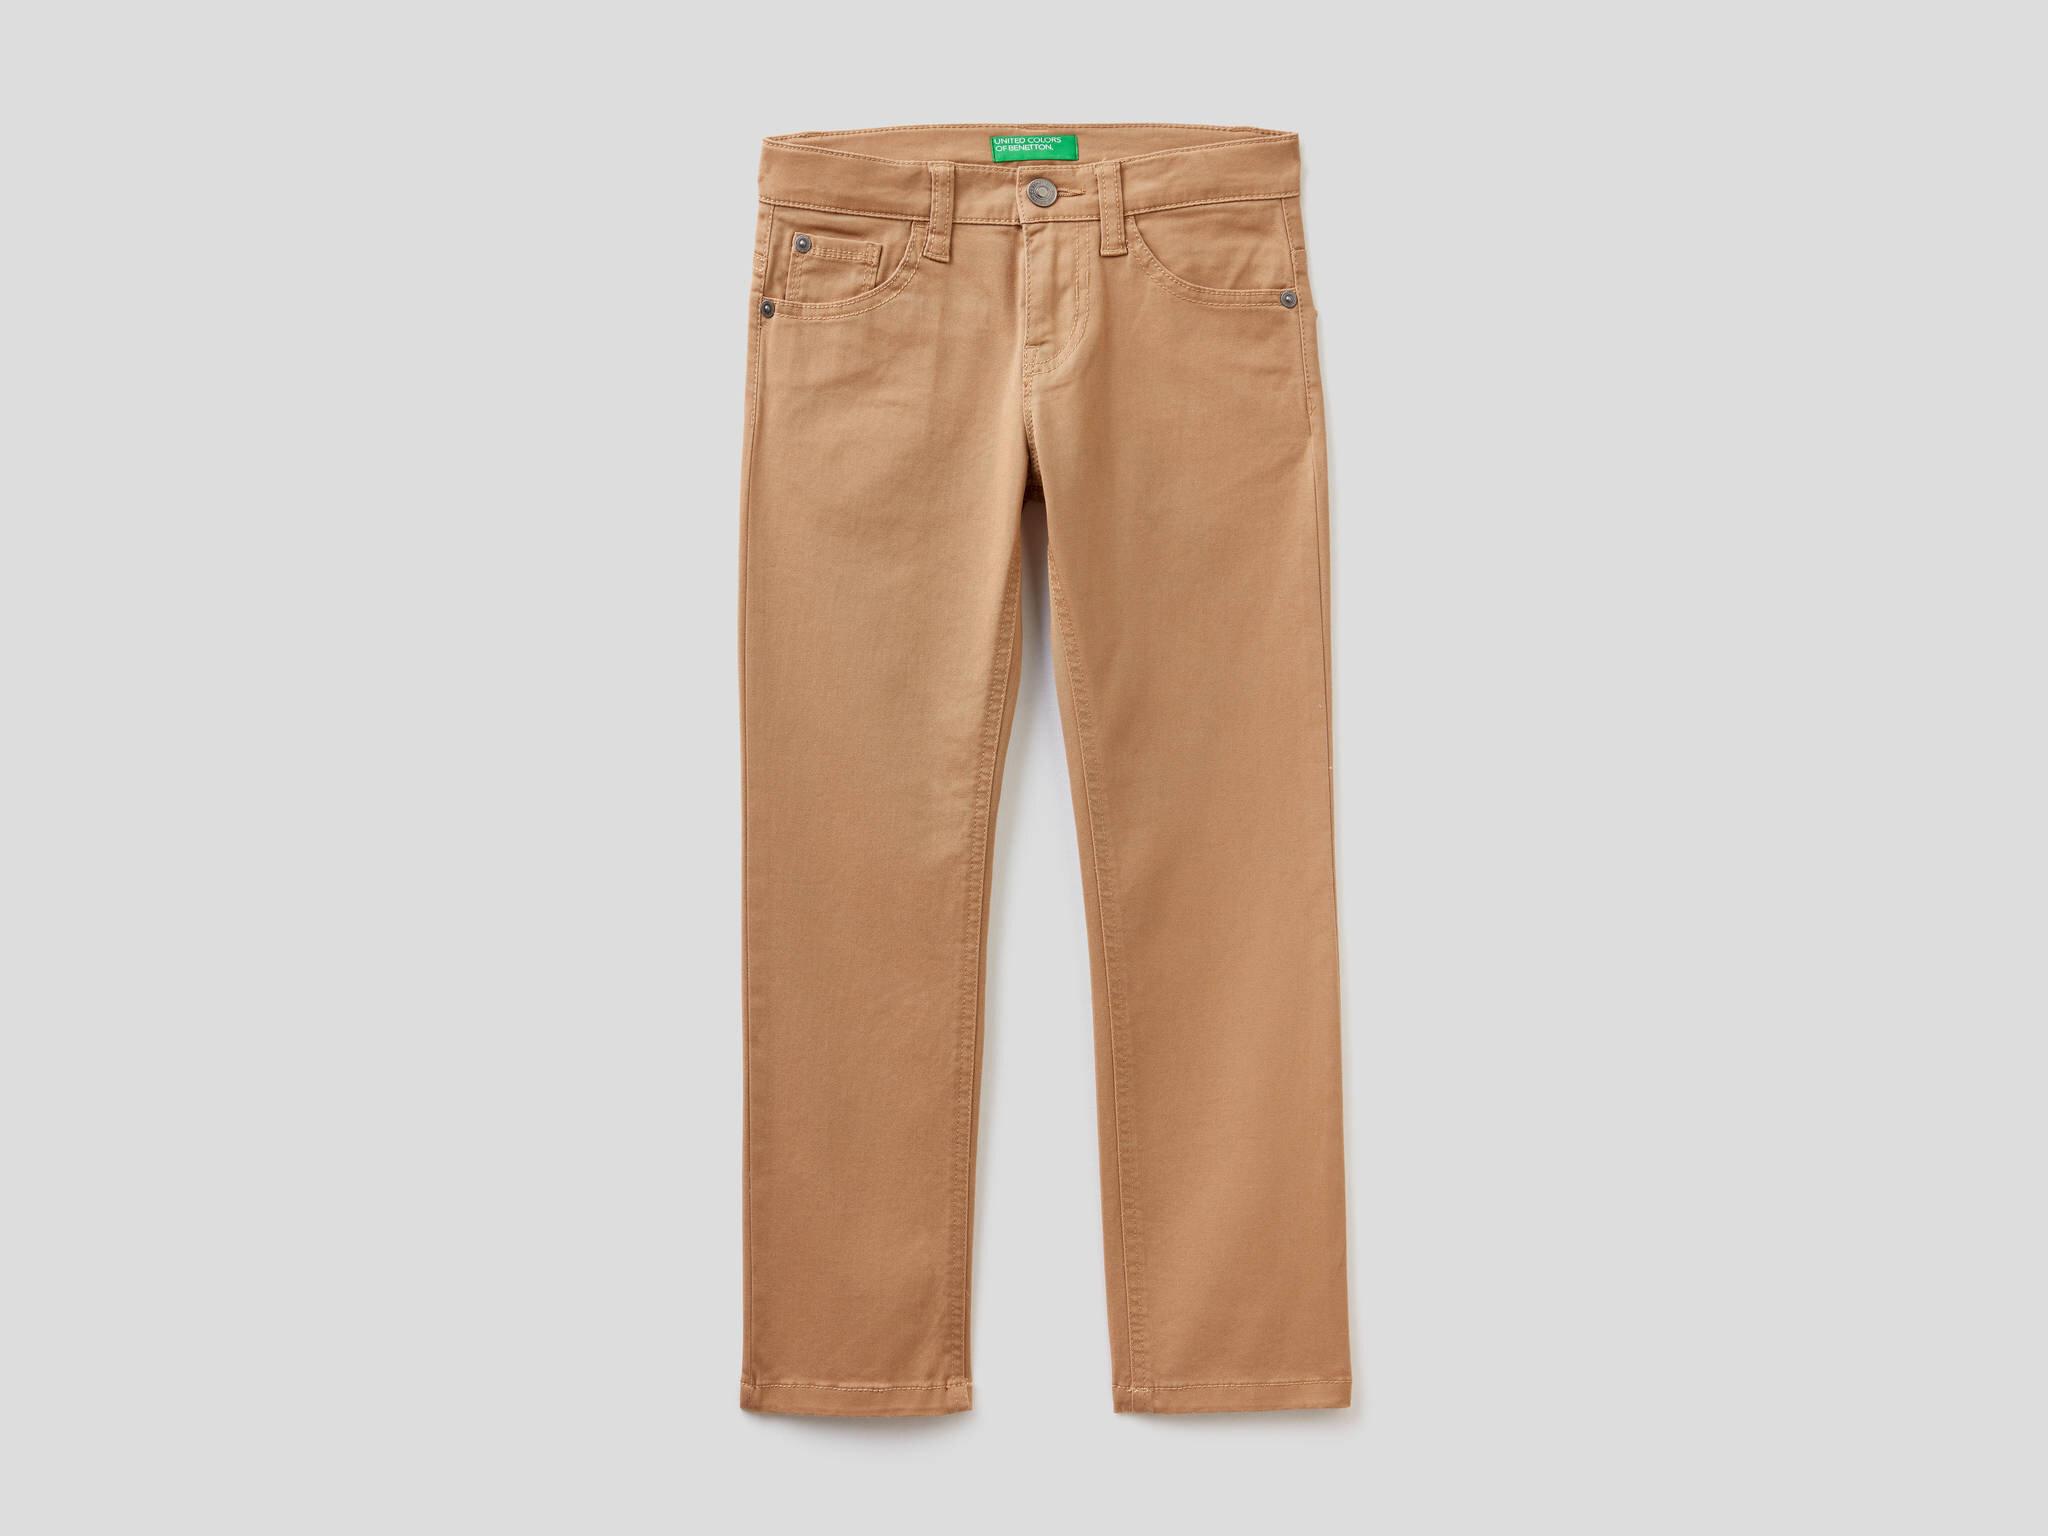 Beş Cepli Renkli Pantolon